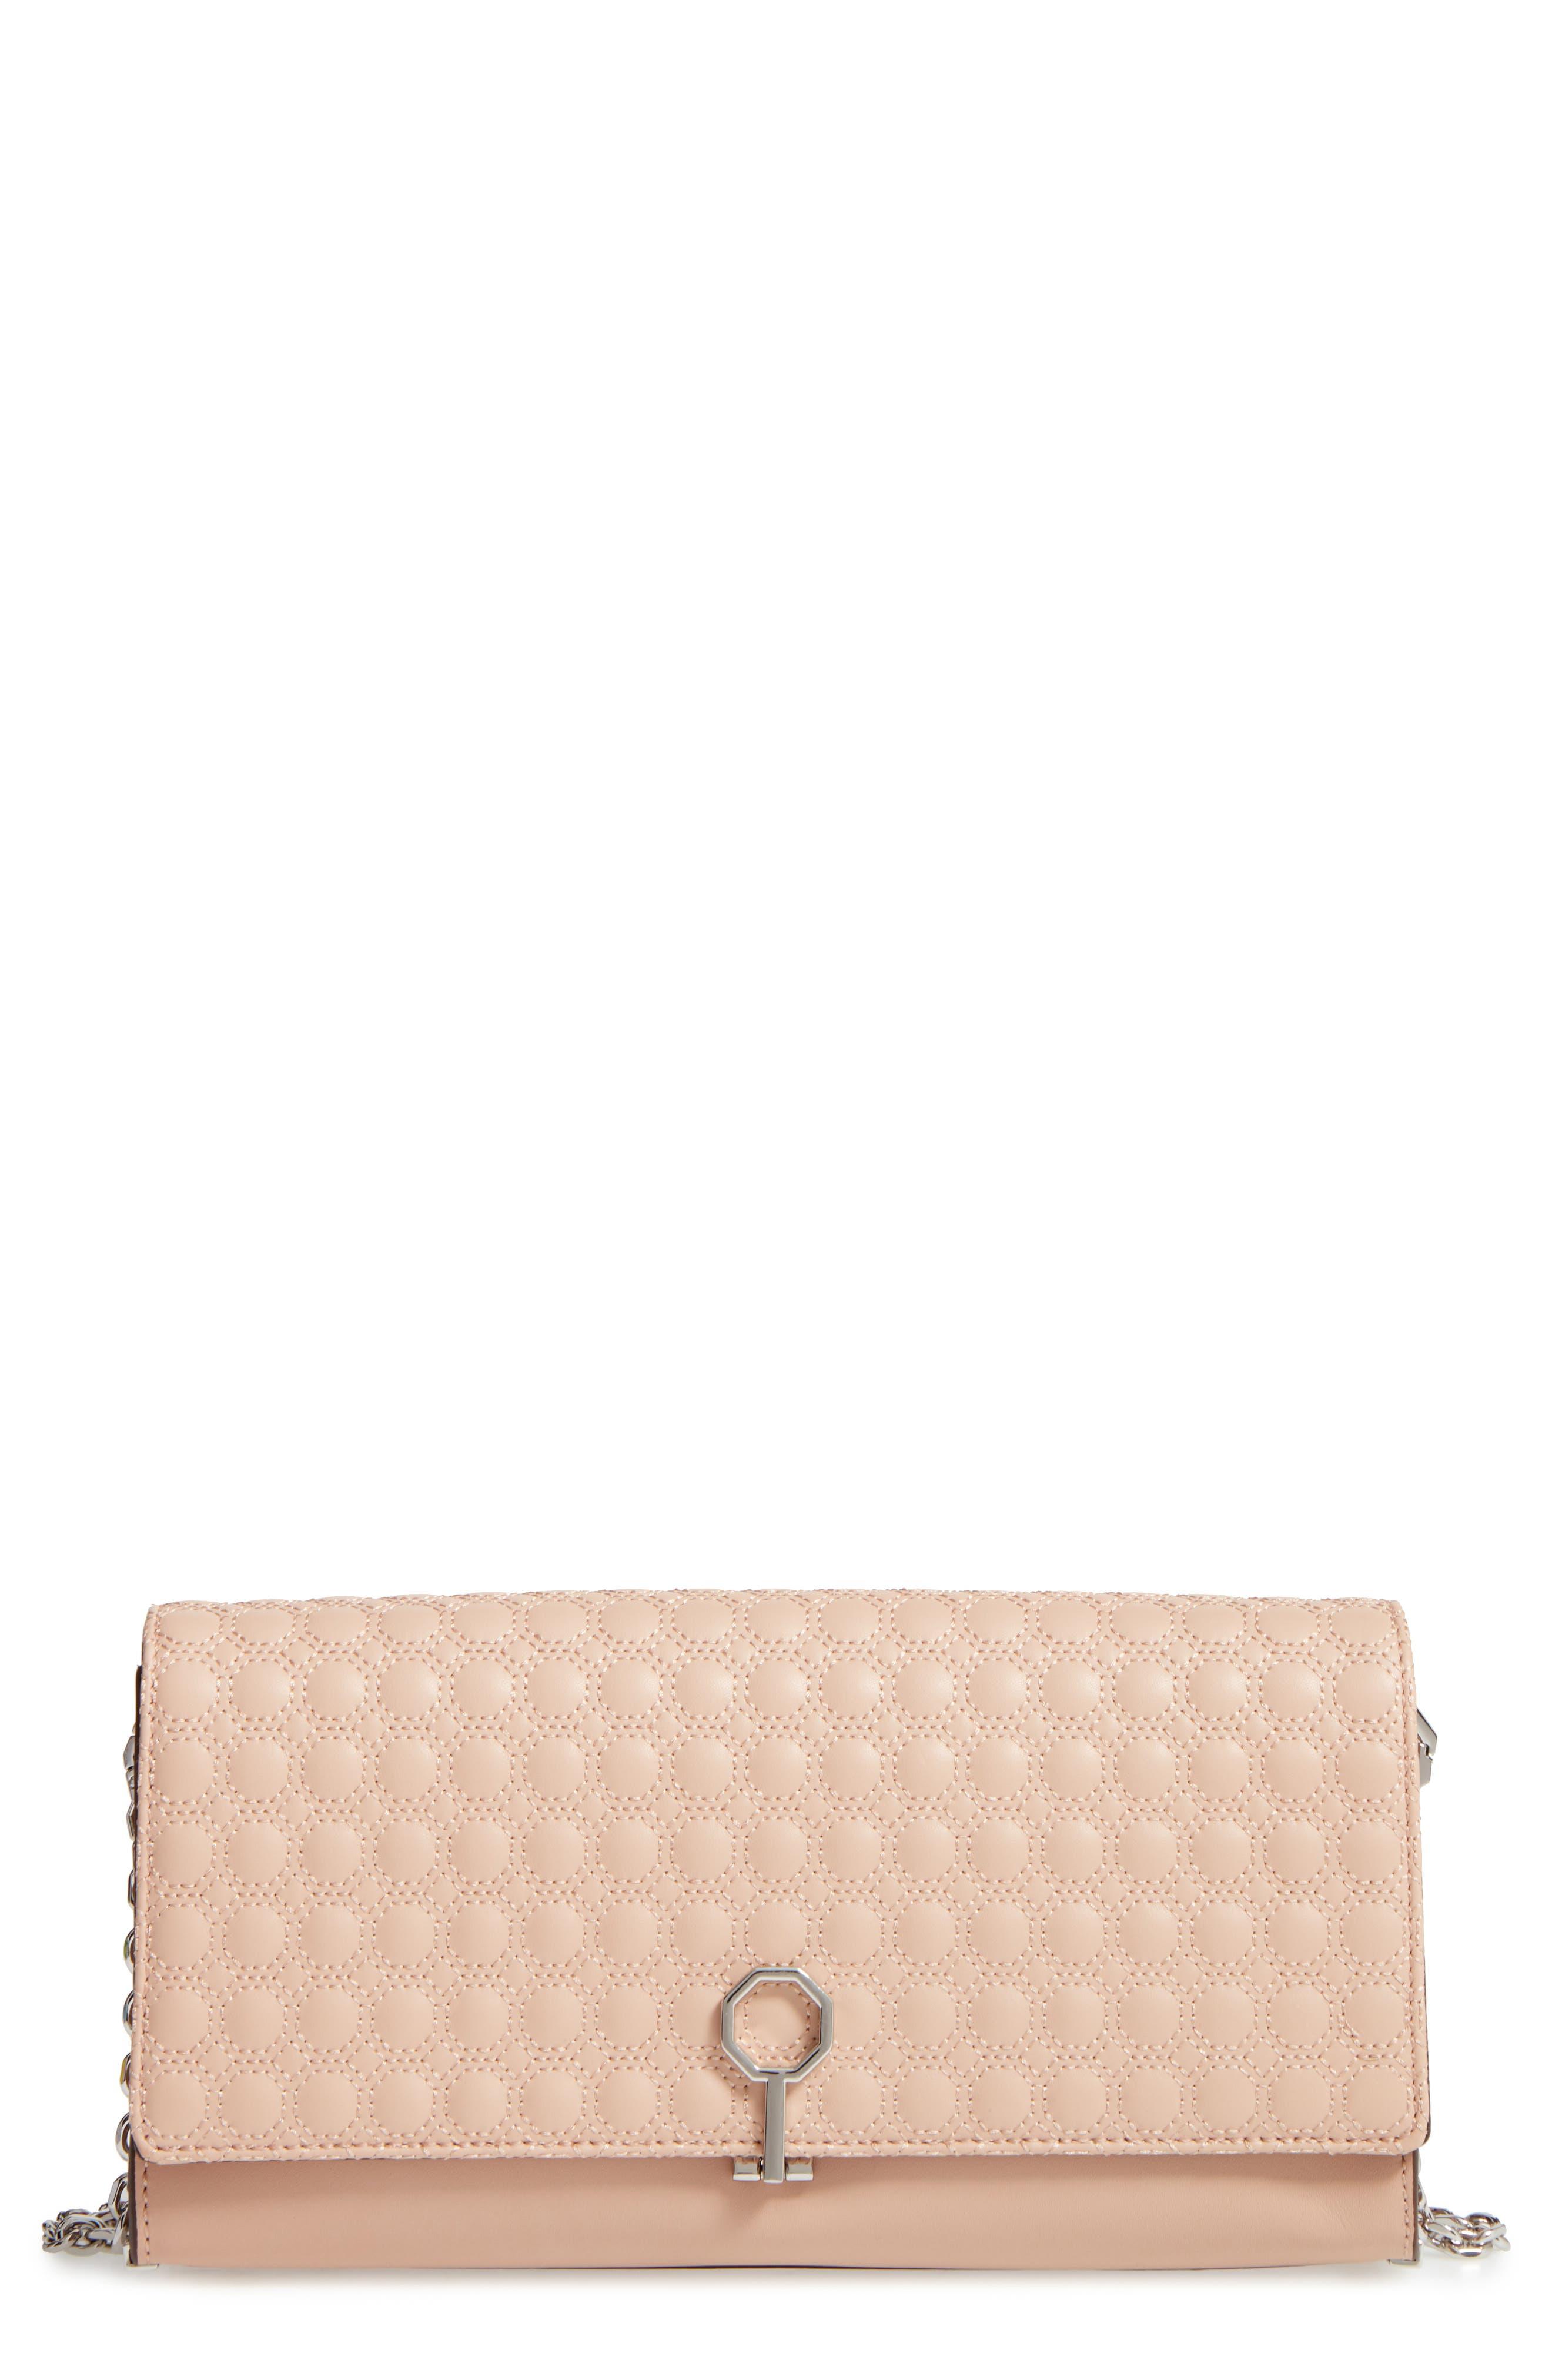 'Yvet' Leather Flap Clutch,                             Main thumbnail 3, color,